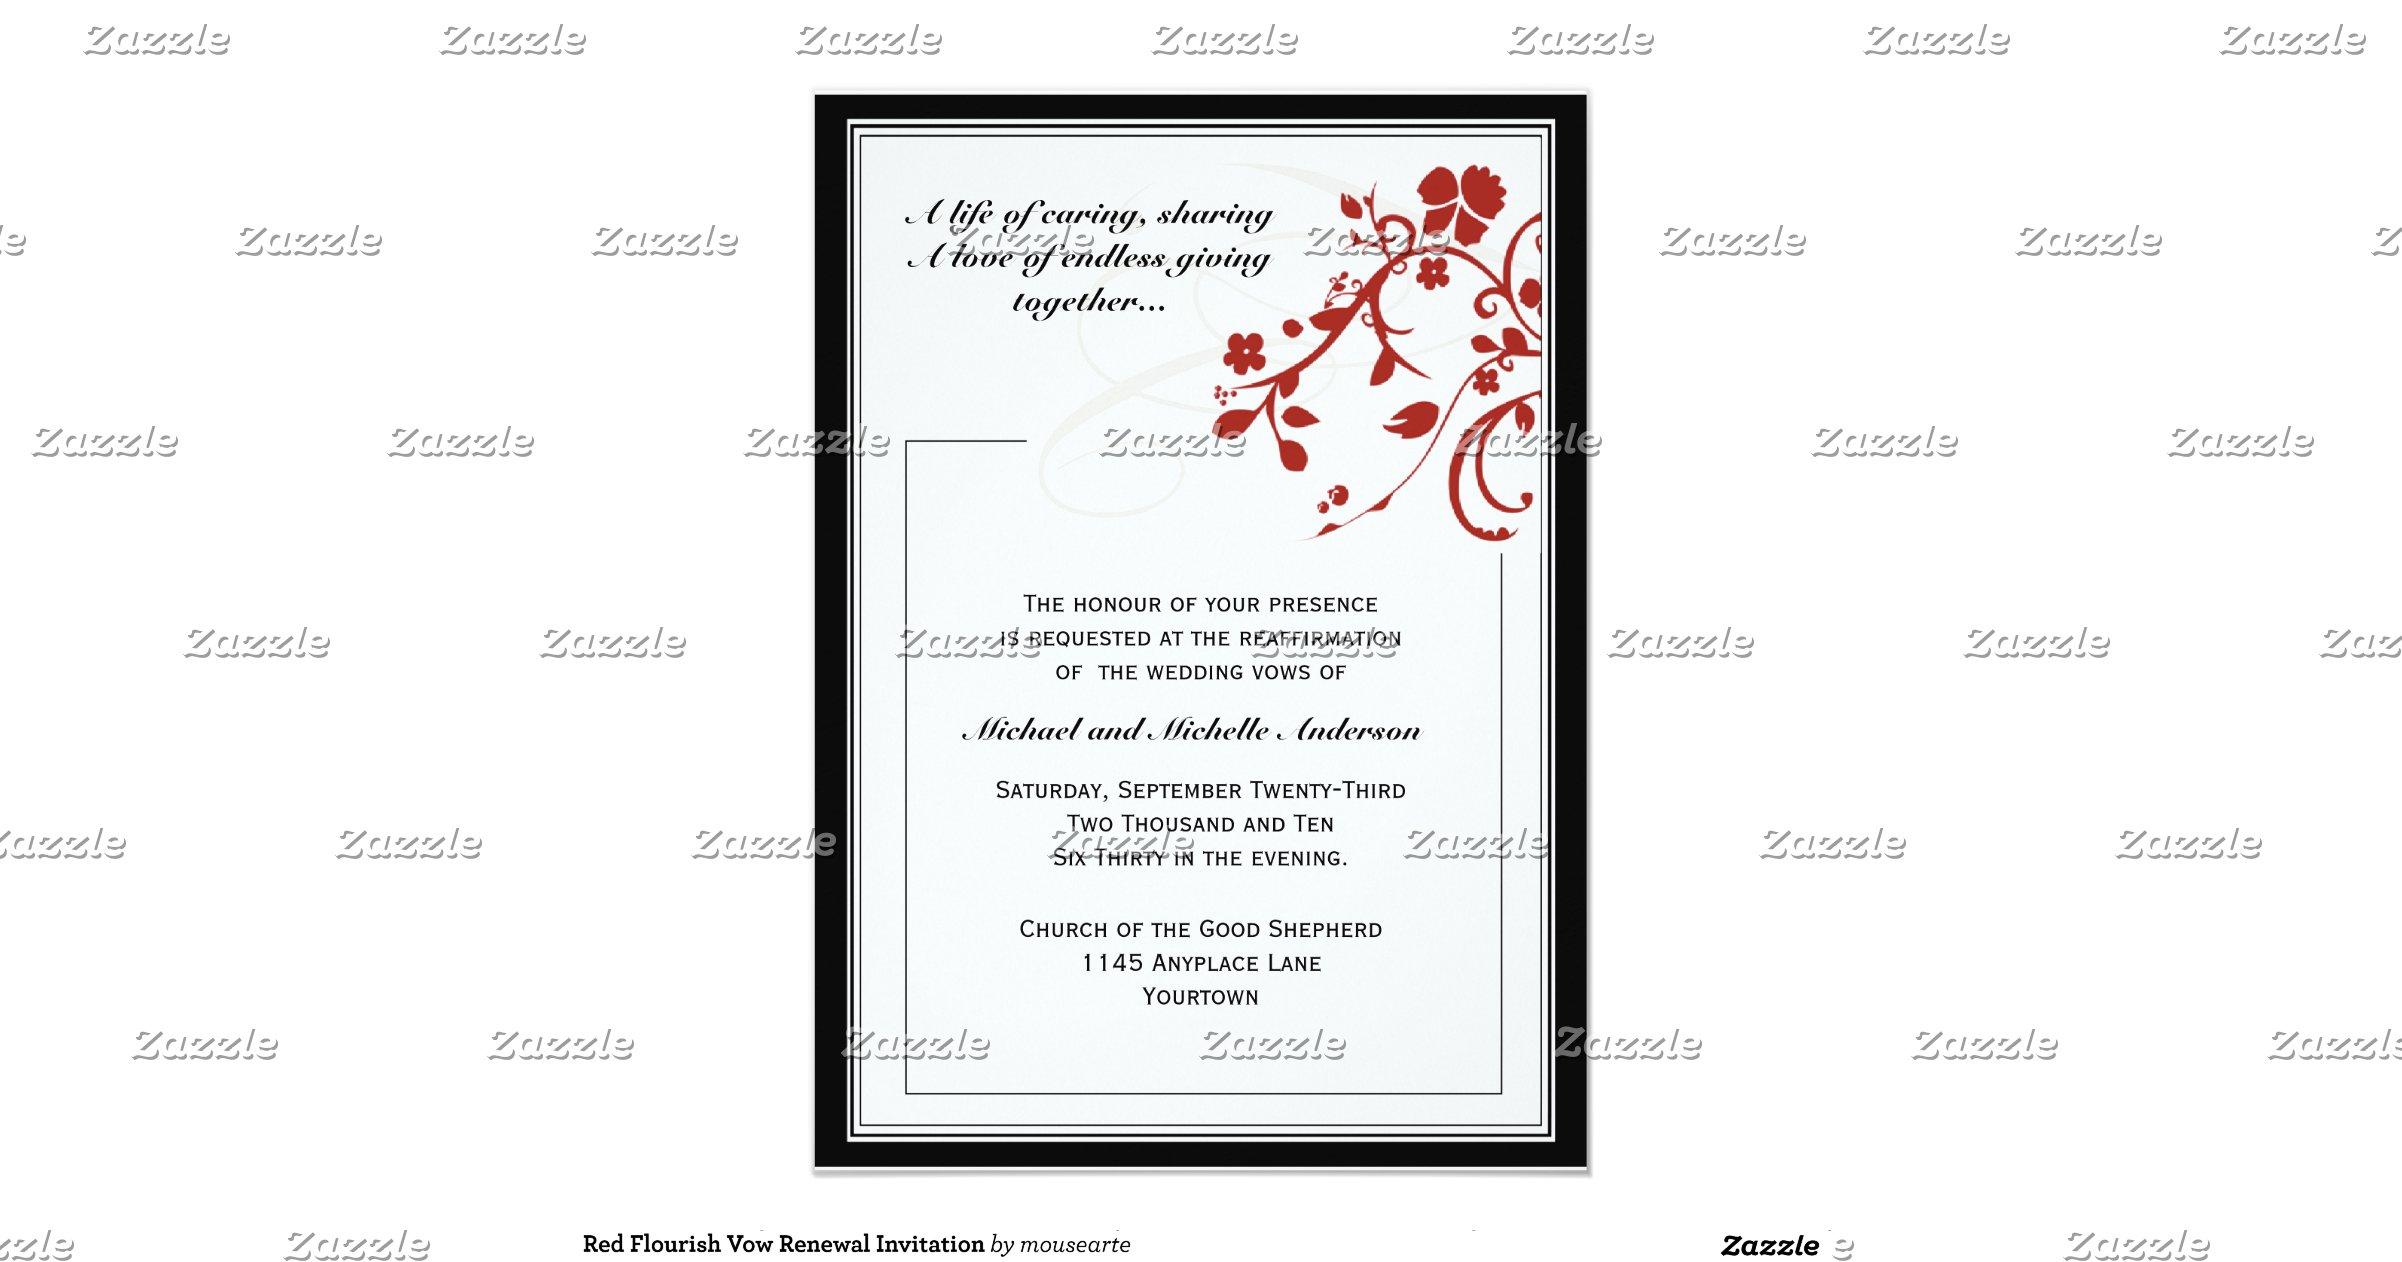 red_flourish_vow_renewal_invitation